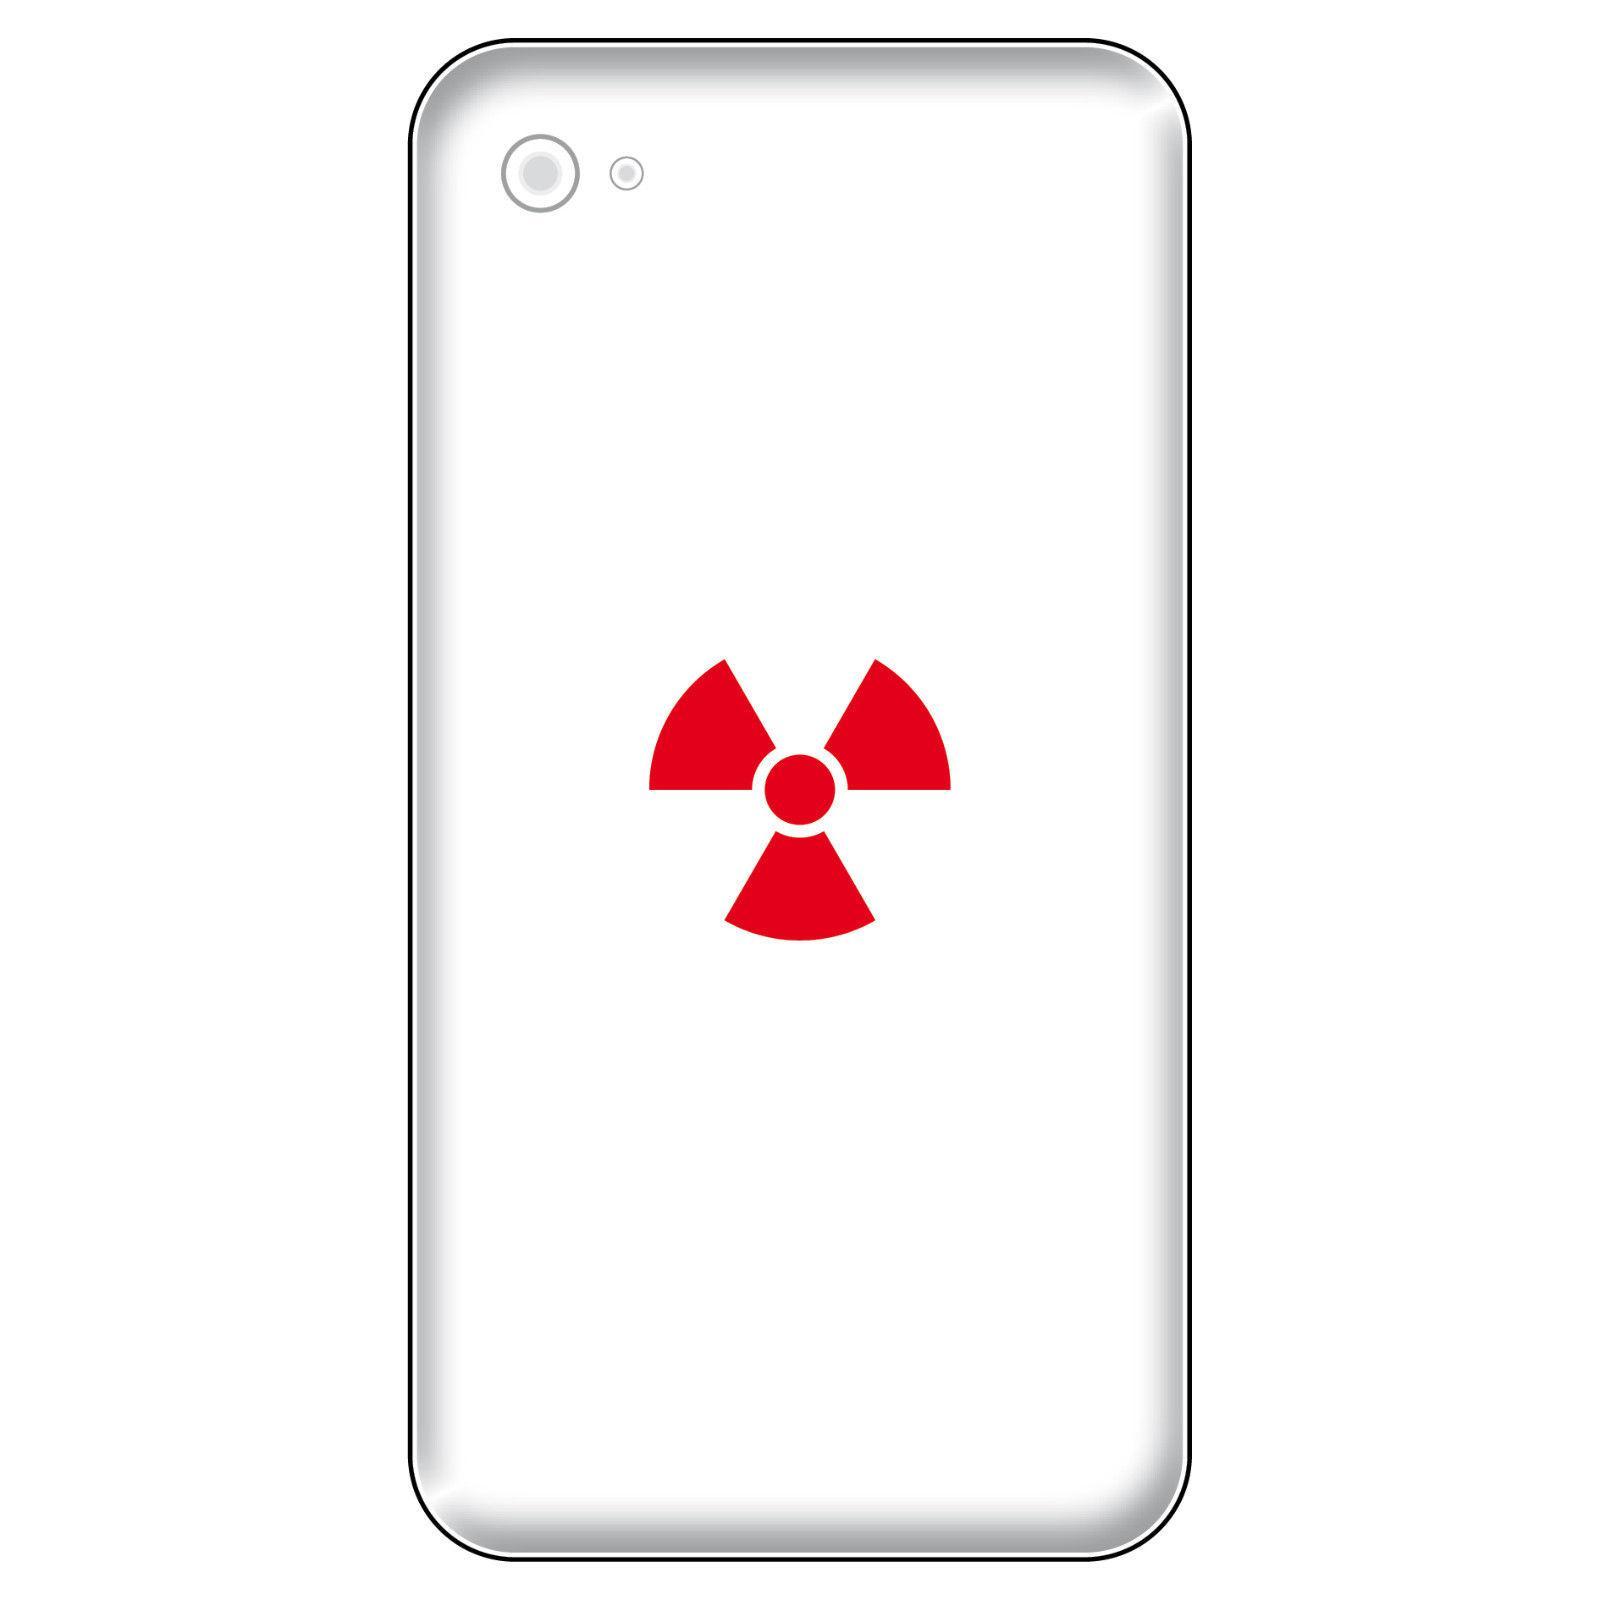 8 Aufkleber Tattoo 2, 5cm Rot Radioaktiv Symbol Logo Handy Smartphone Deko  Folie 1 ...